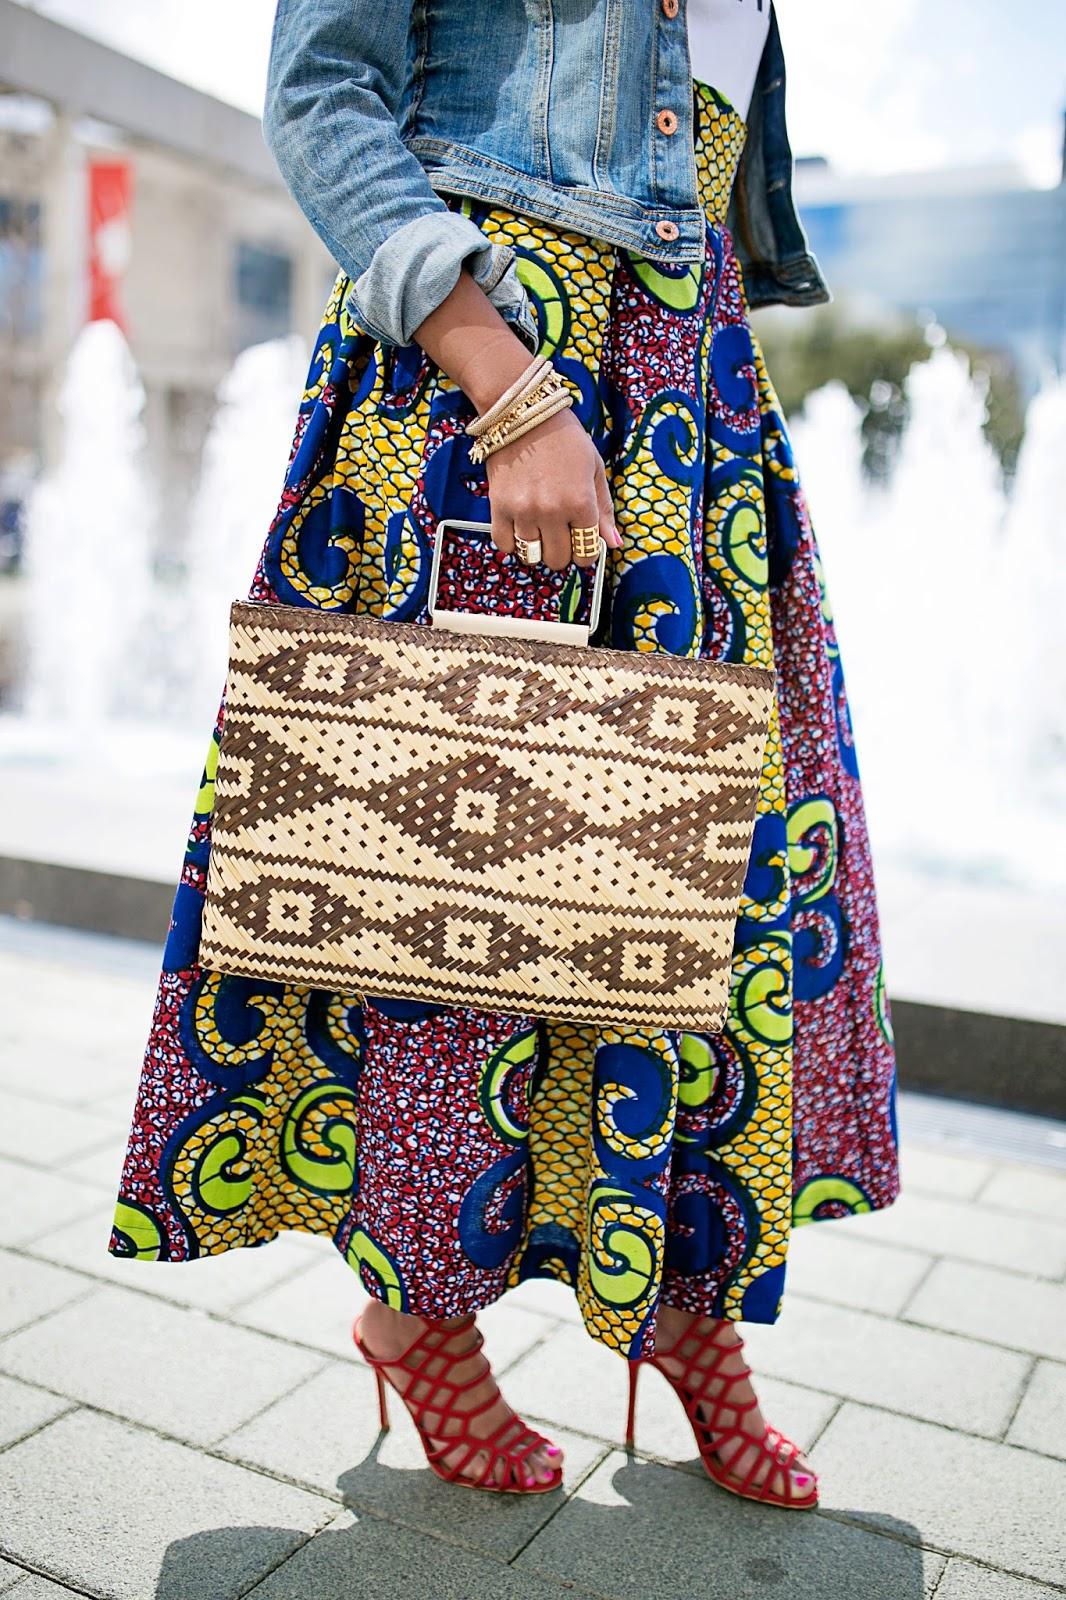 how to wear midi skirt - how to wear bold prints - Ankara print midi skirt - Steve Madden Slithur in Red- haute mama t shirt- banana republic straw handbag- fashion blogger- dallas blogger- CAS Clothing- black girl blogger